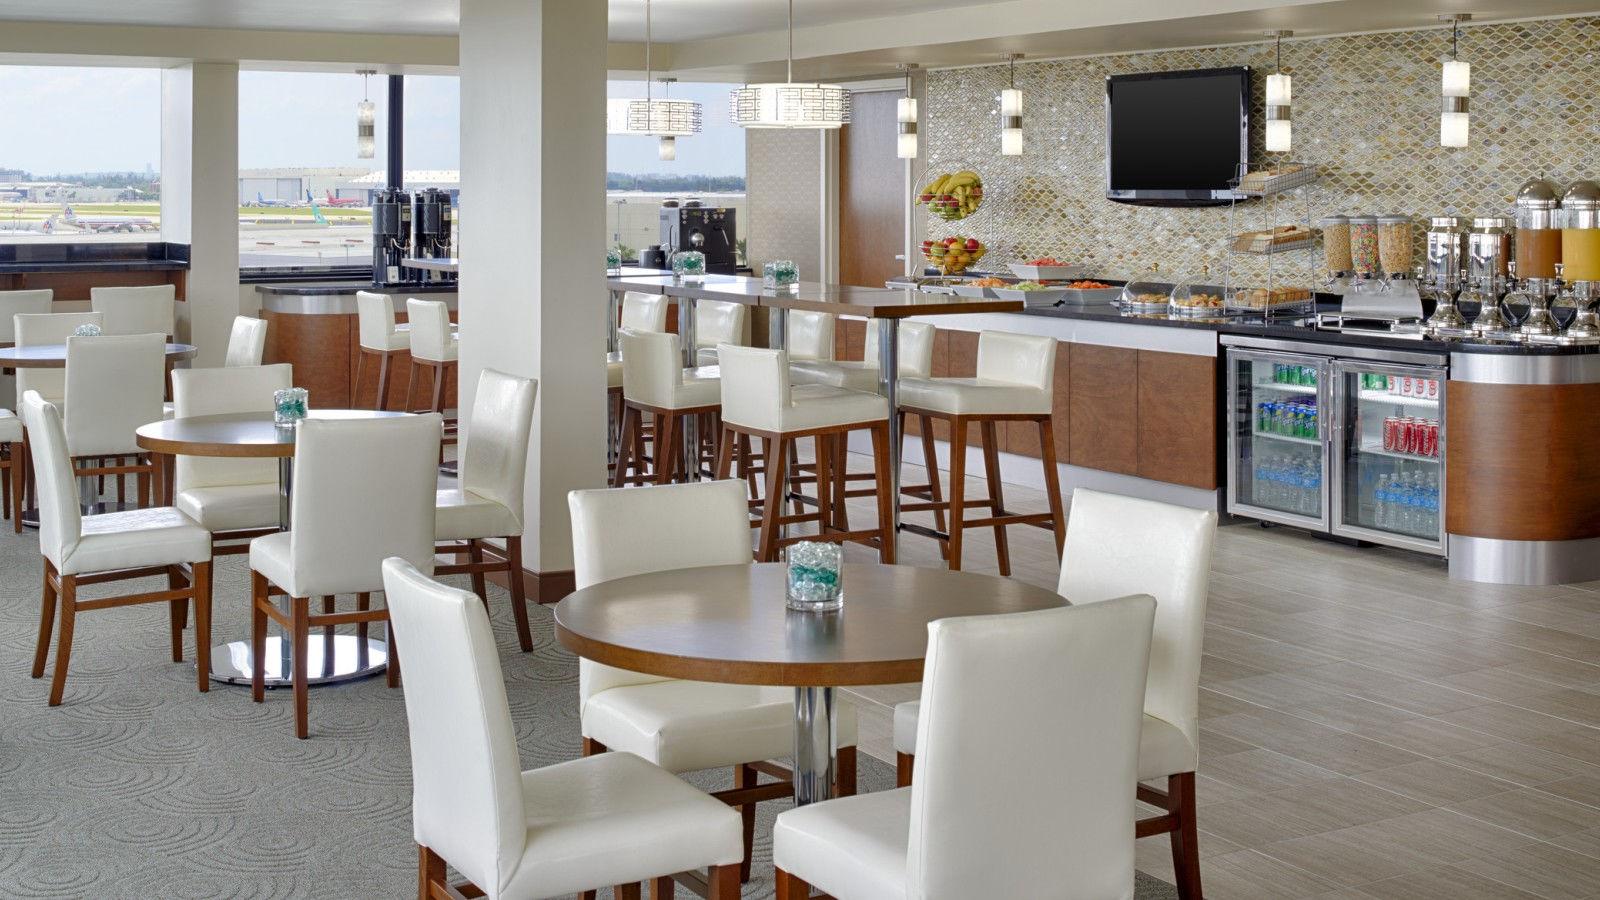 Sheraton Miami Airport Hotel & Executive Meeting Center image 12